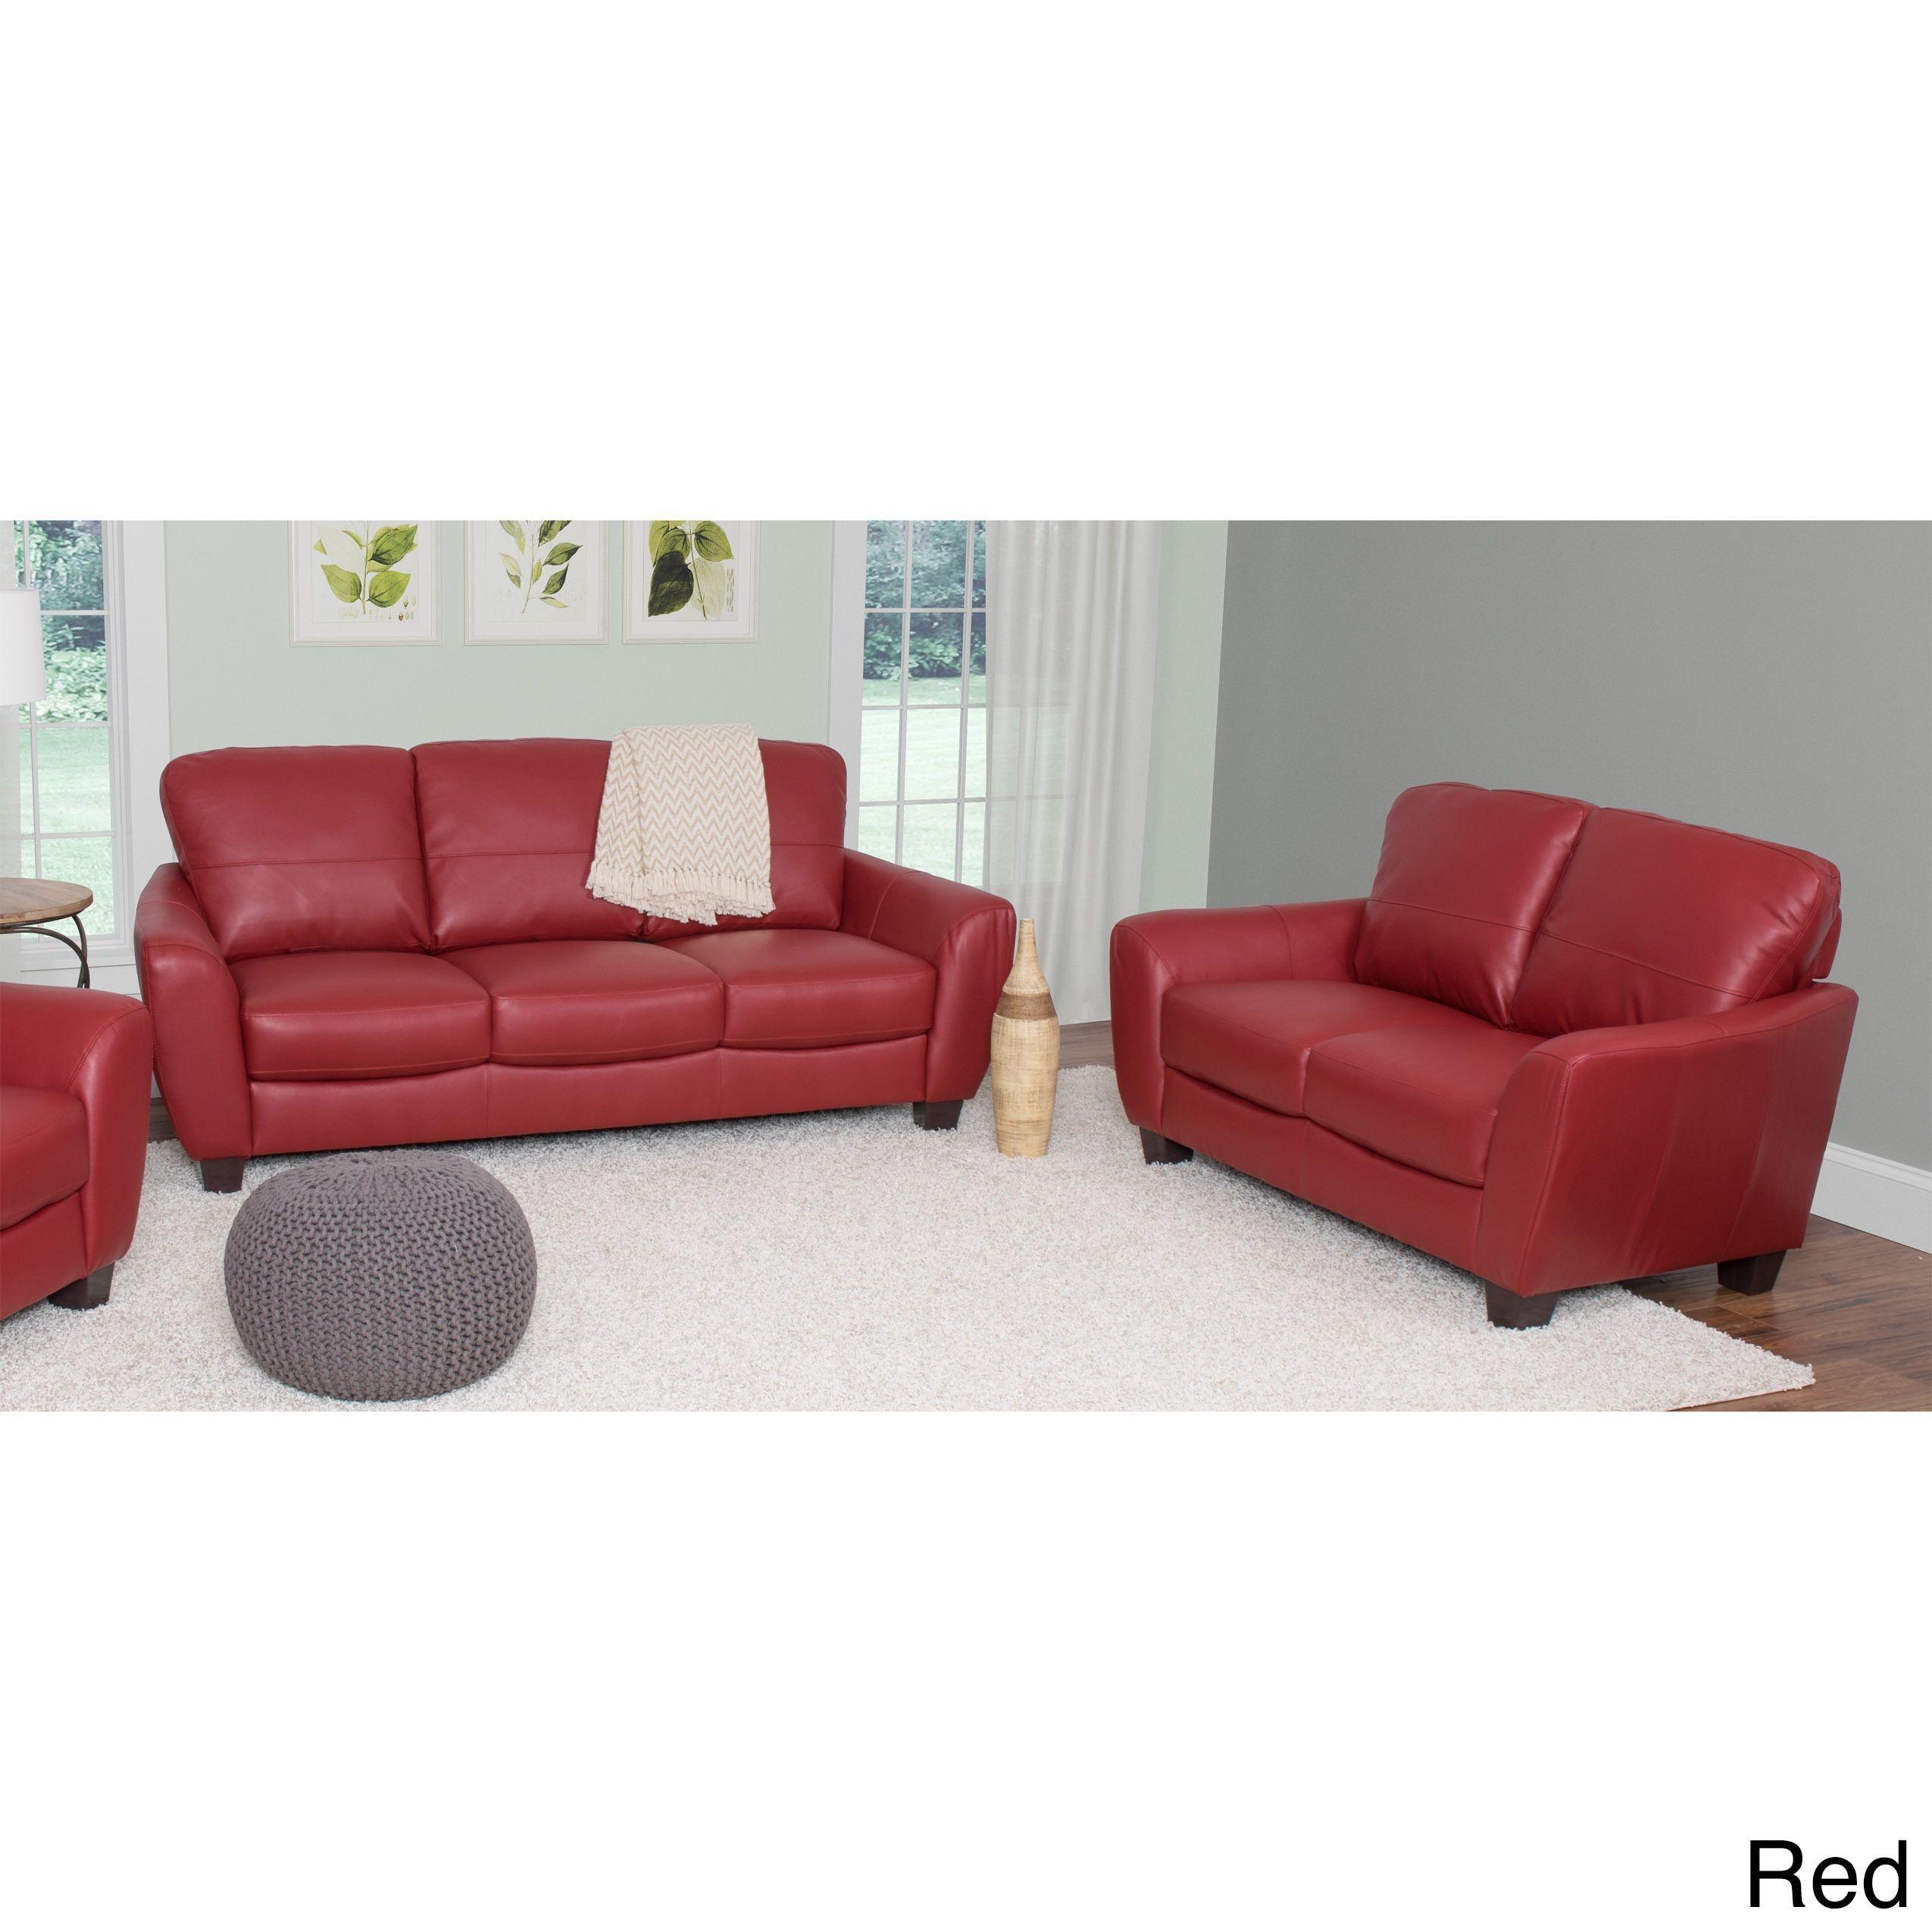 corliving jazz 2 piece bonded leather sofa set black leather rh za pinterest com